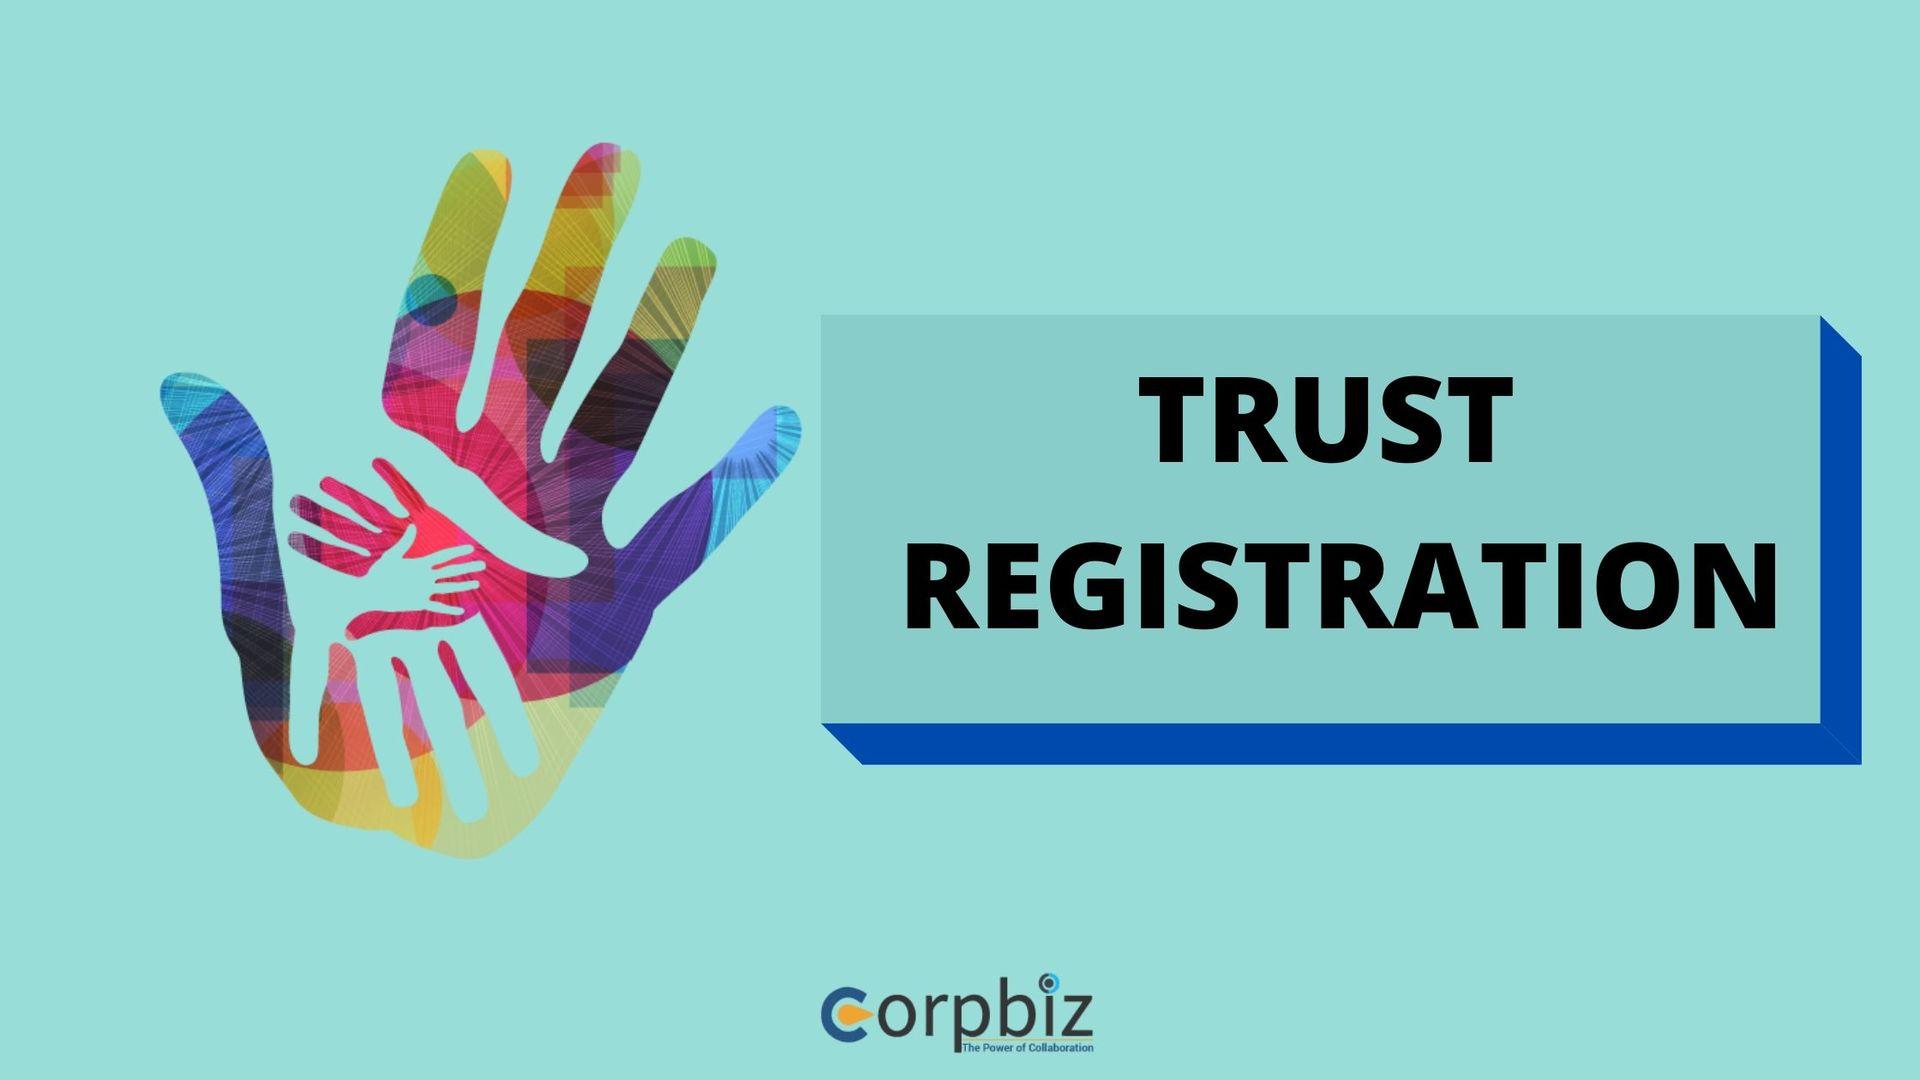 Trust Registration in India - Process, Documents, Benefits - Corpbiz